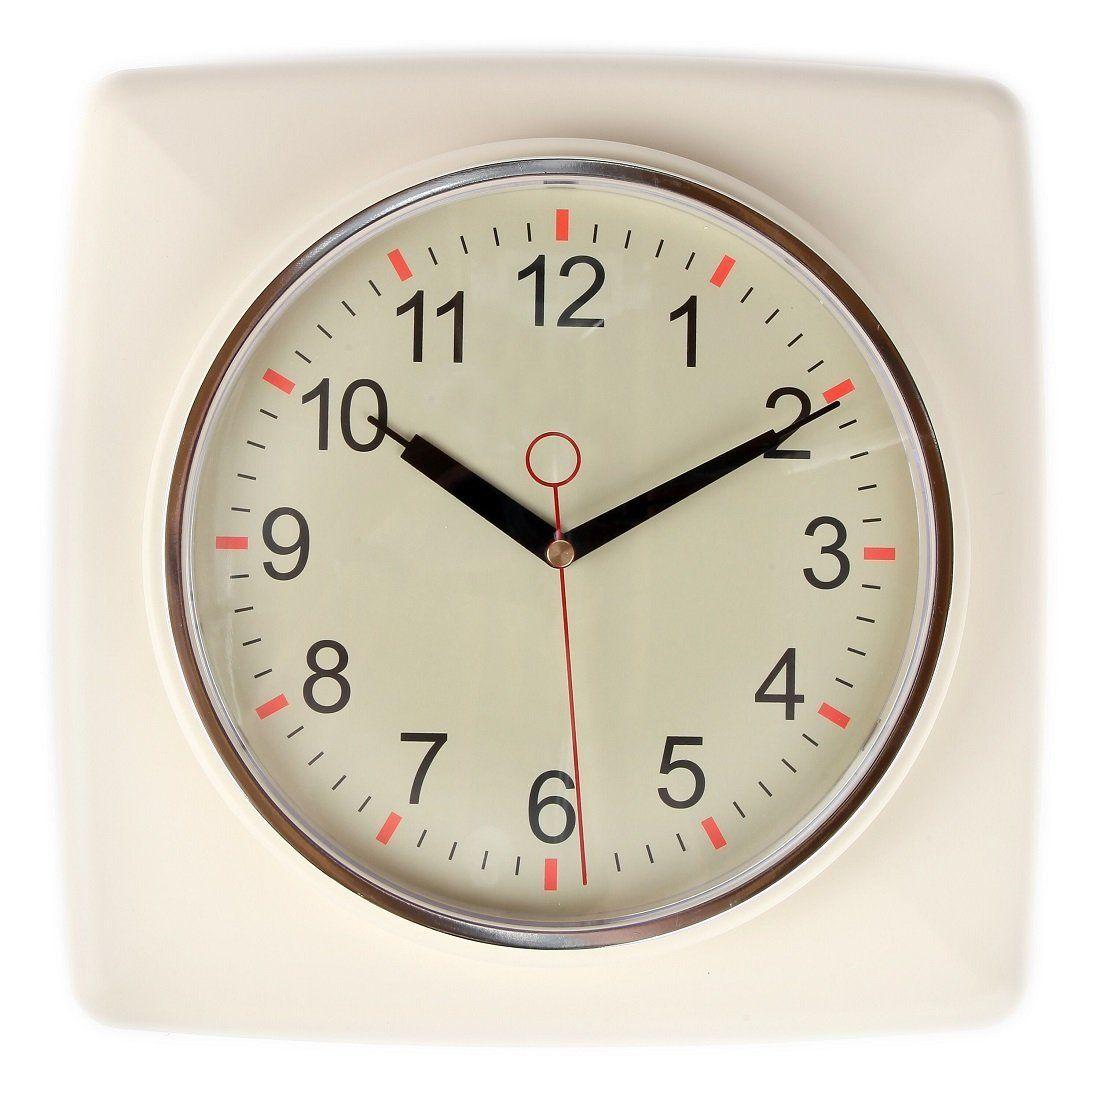 Lily\'s Home Square Retro Kitchen Wall Clock, Large Dial Quartz ...